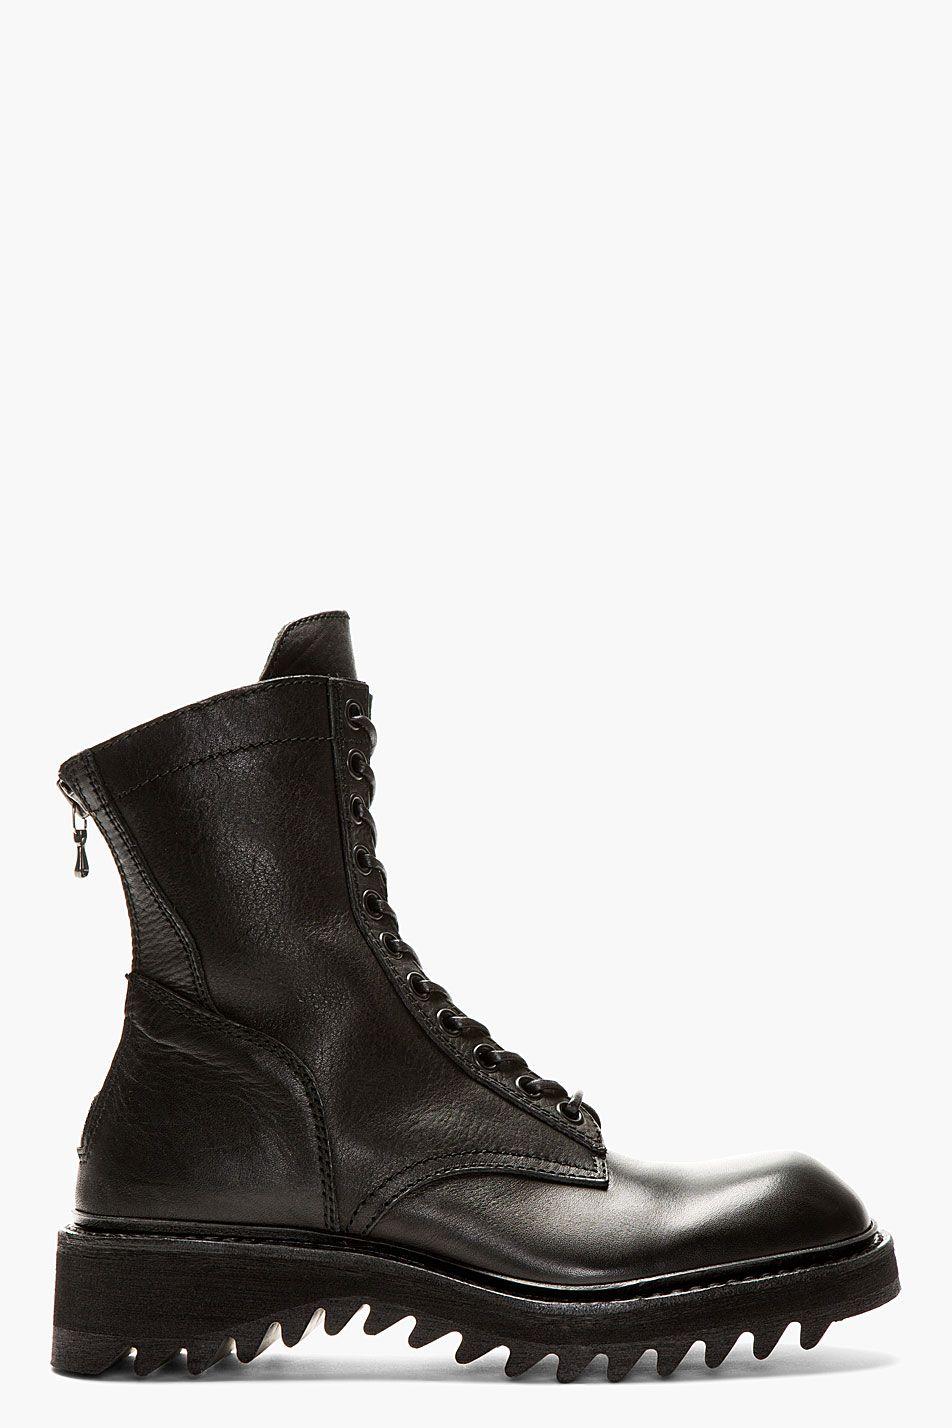 JULIUS Black leather zipped COMBAT BOOTS | Scarpe sandali